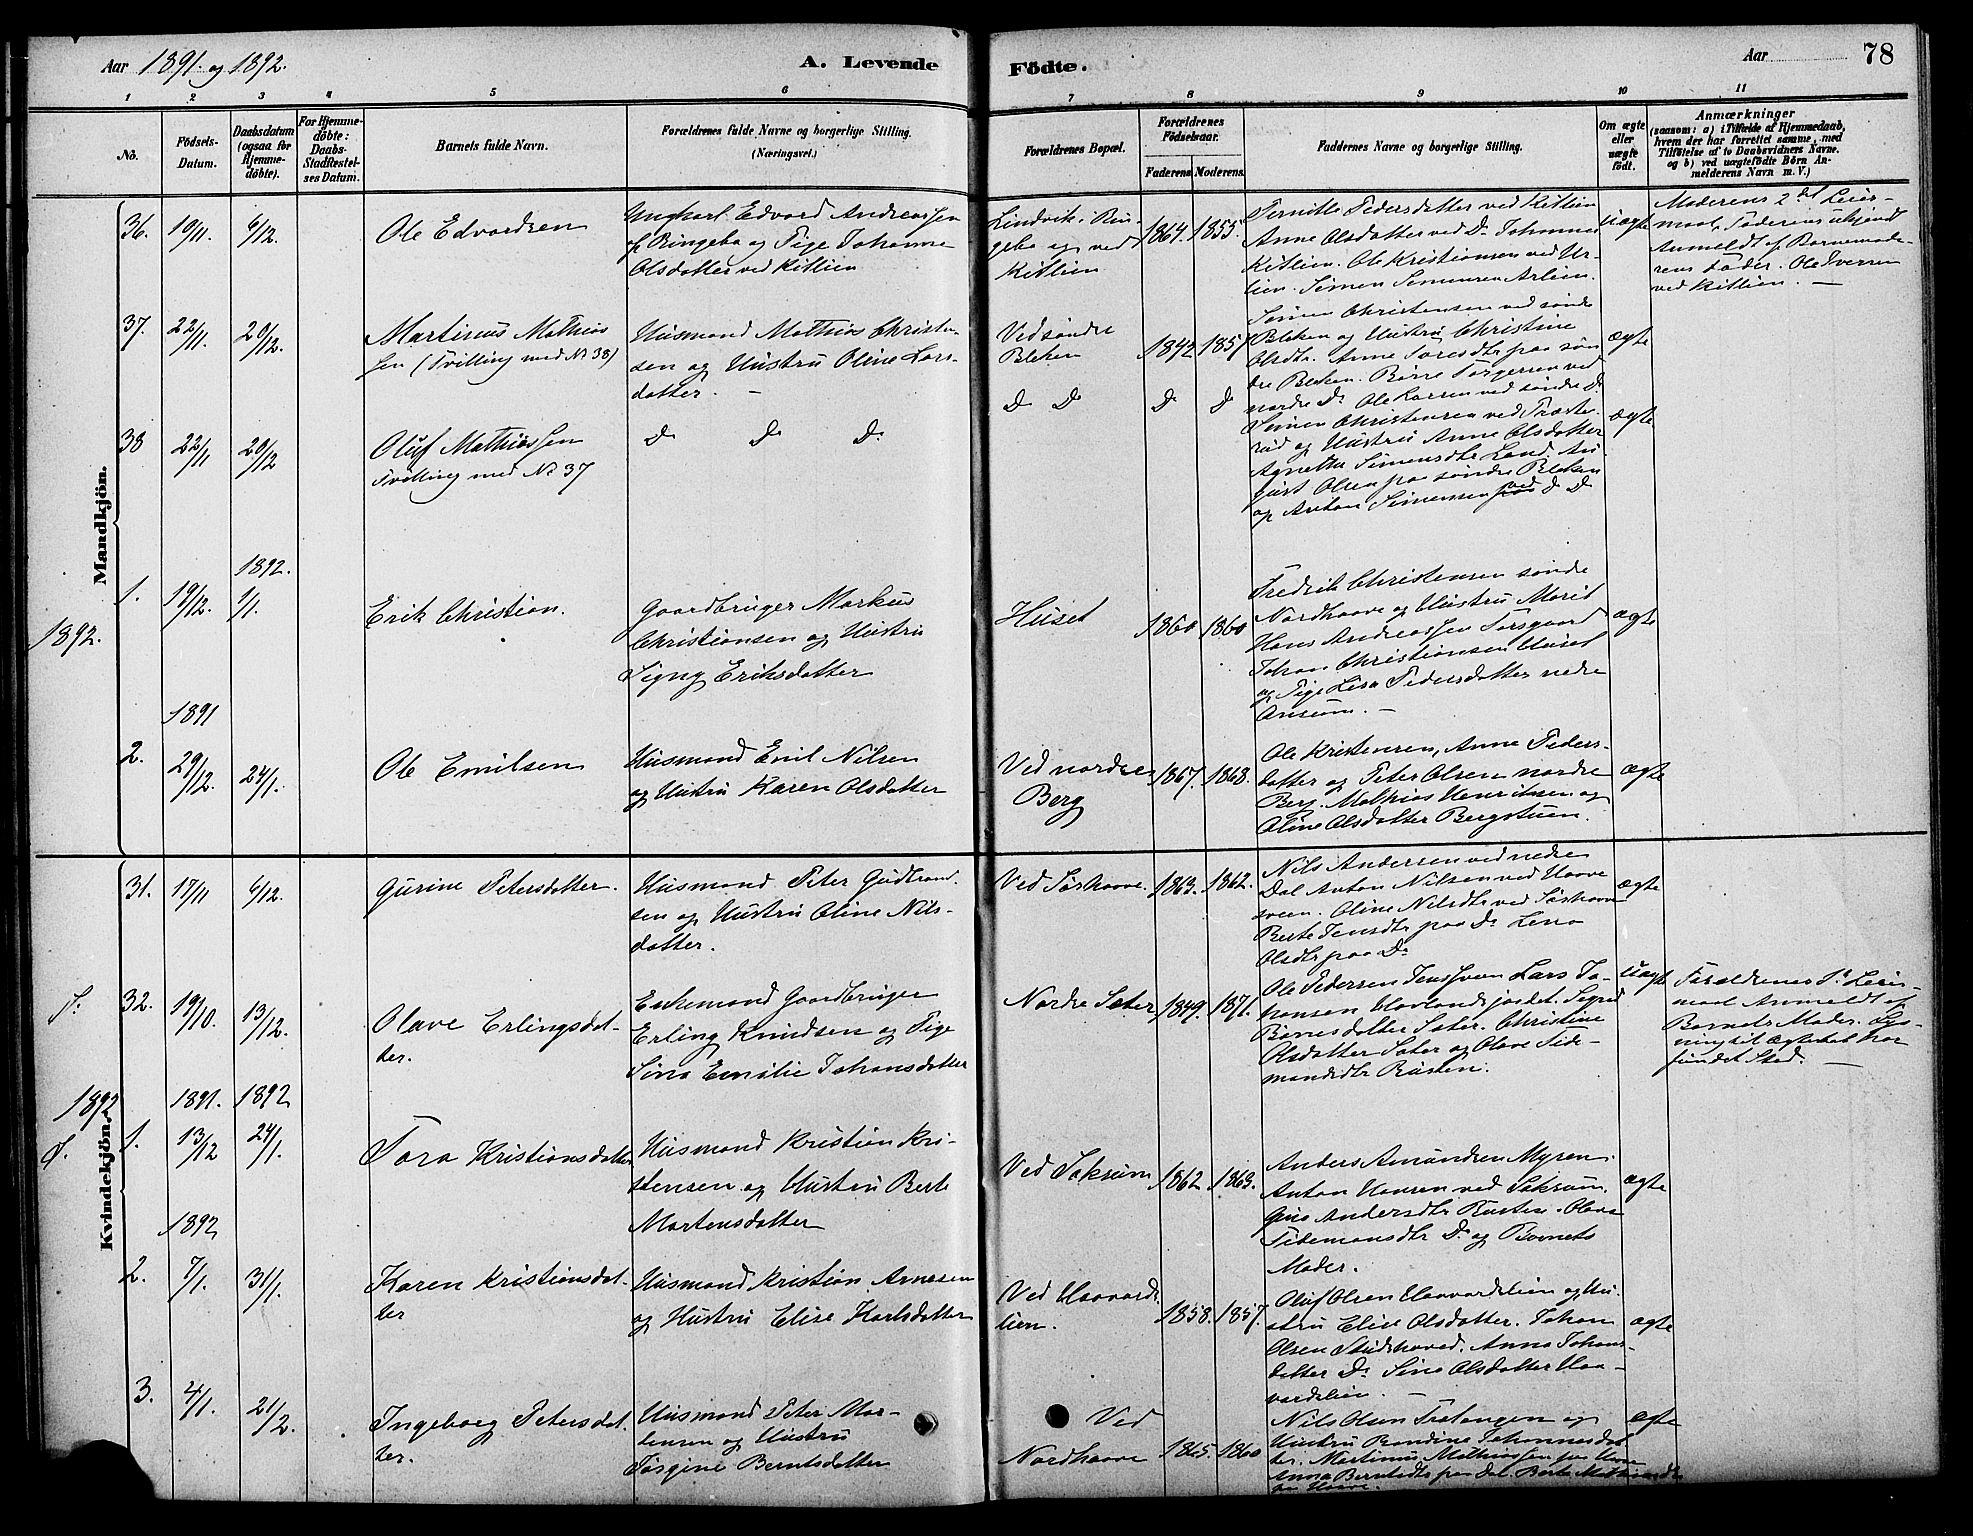 SAH, Fåberg prestekontor, Ministerialbok nr. 8, 1879-1898, s. 78